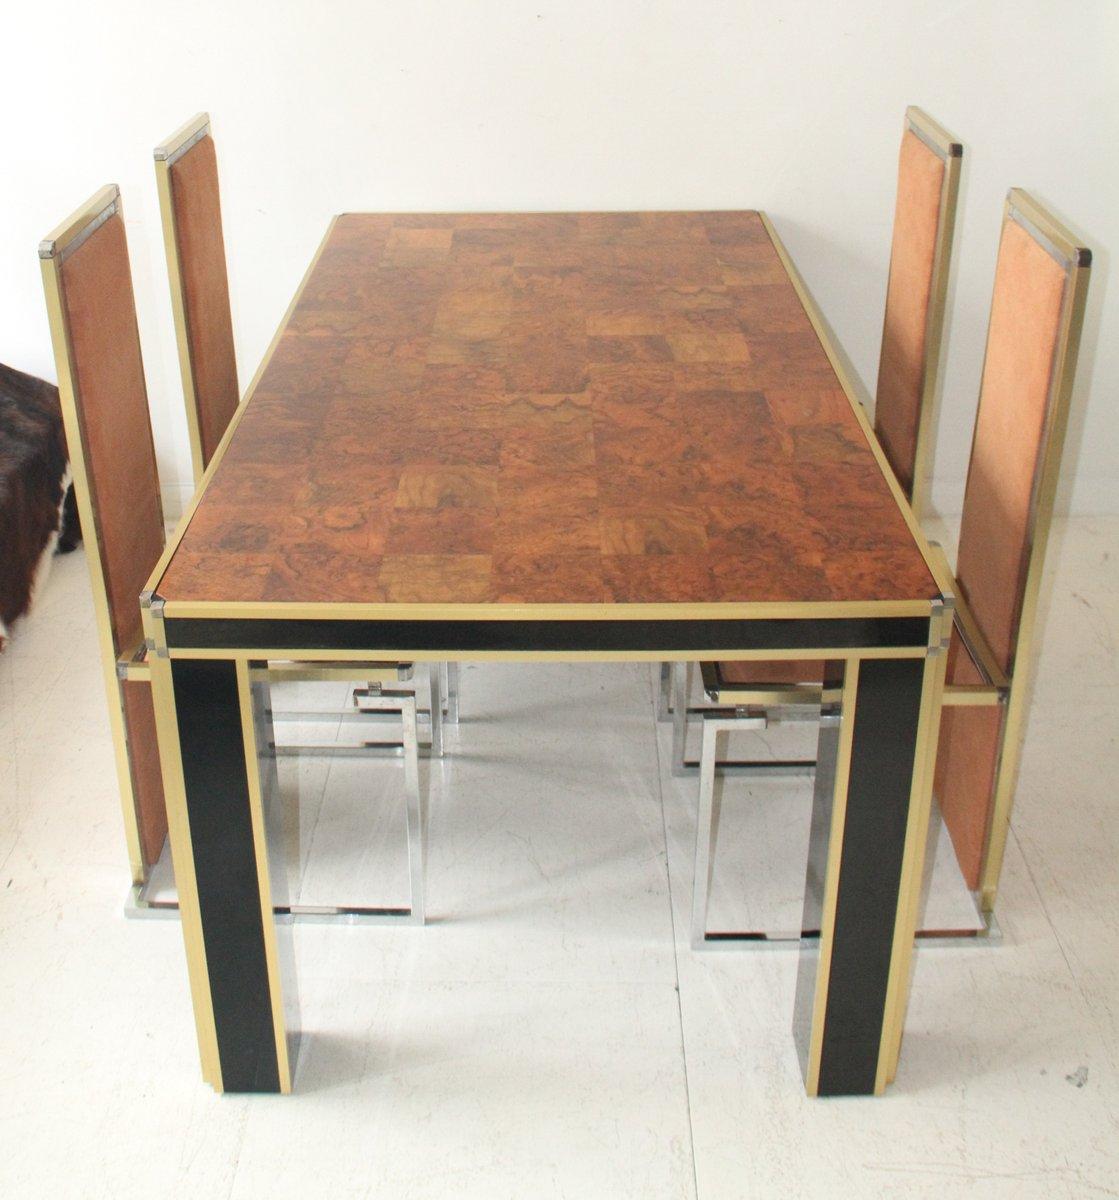 Table de salle manger vintage en noyer vernis par willy rizzo italie - Salle a manger en solde ...